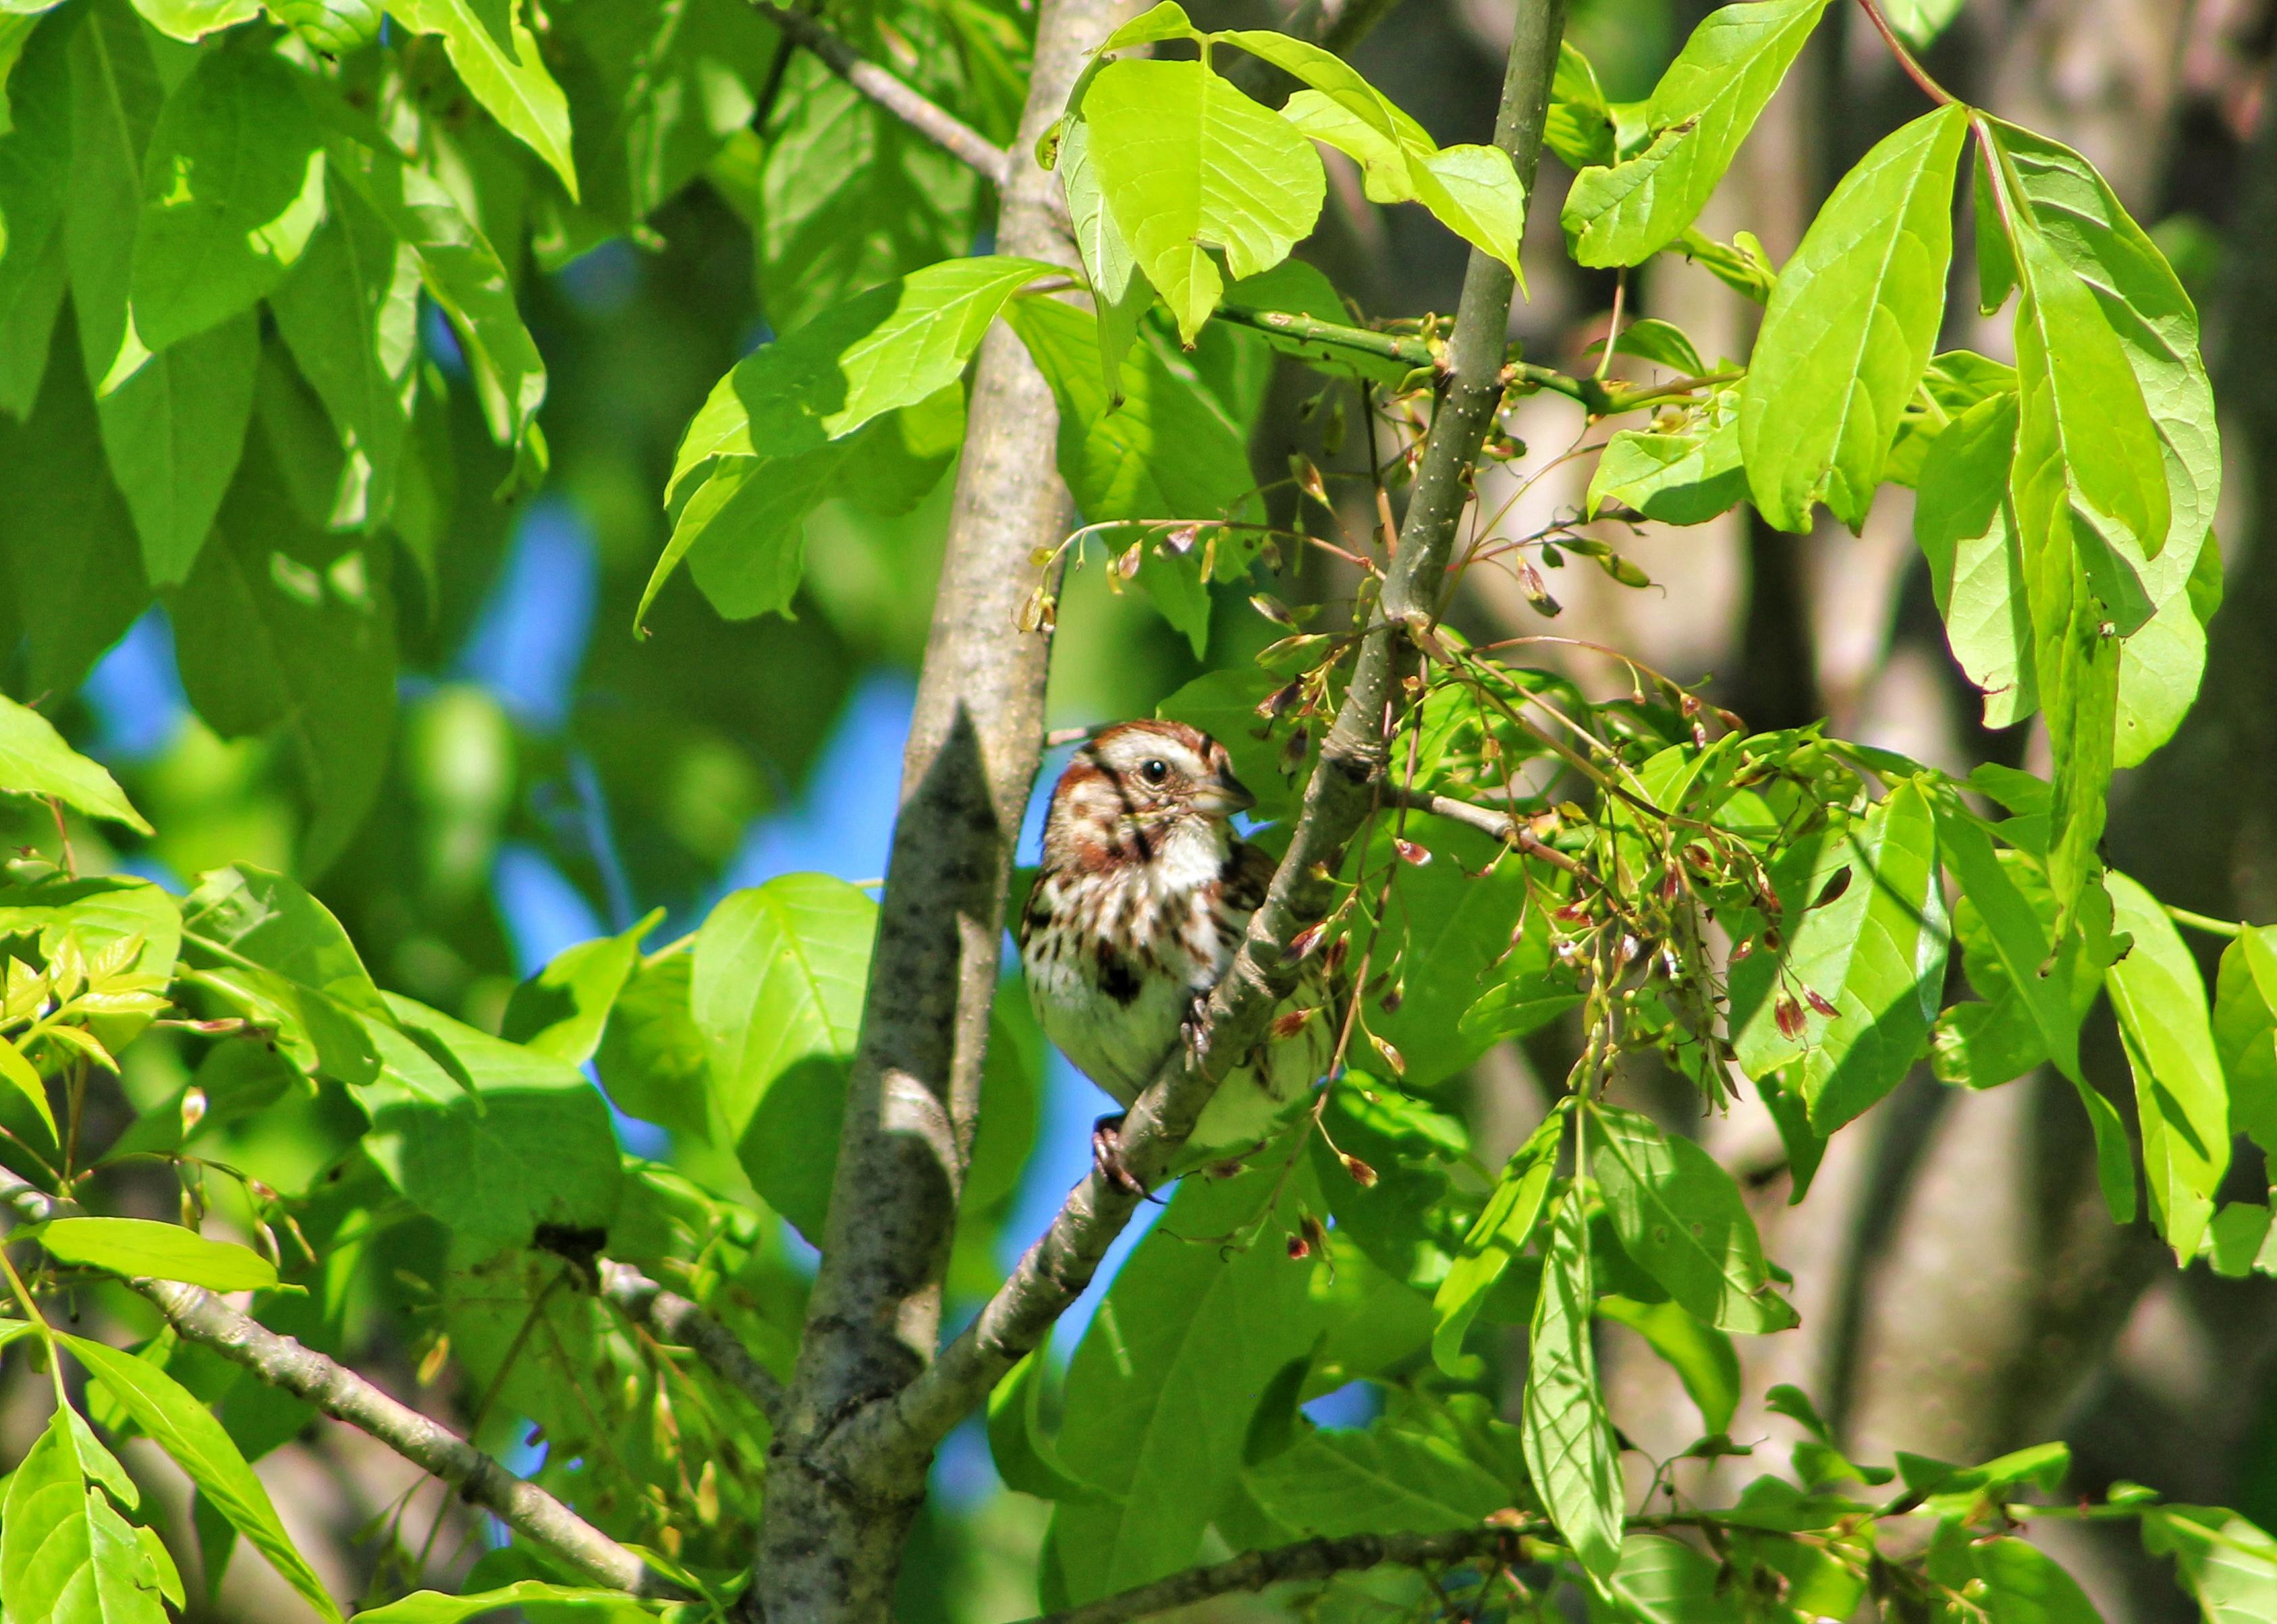 Sparrow side eye photo